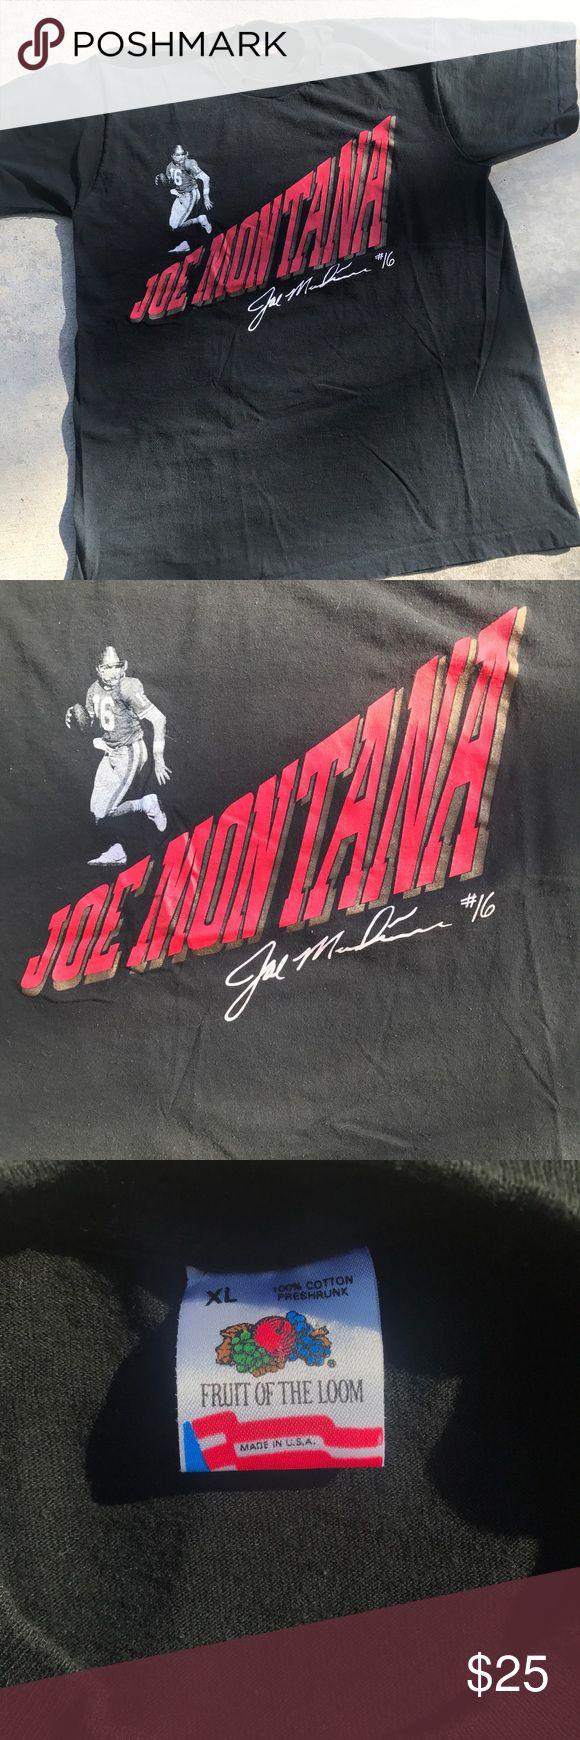 Vintage 80s Joe Montana SF 49ers  shirt XL Nice condition Fruit of the Loom Shirts Tees - Short Sleeve